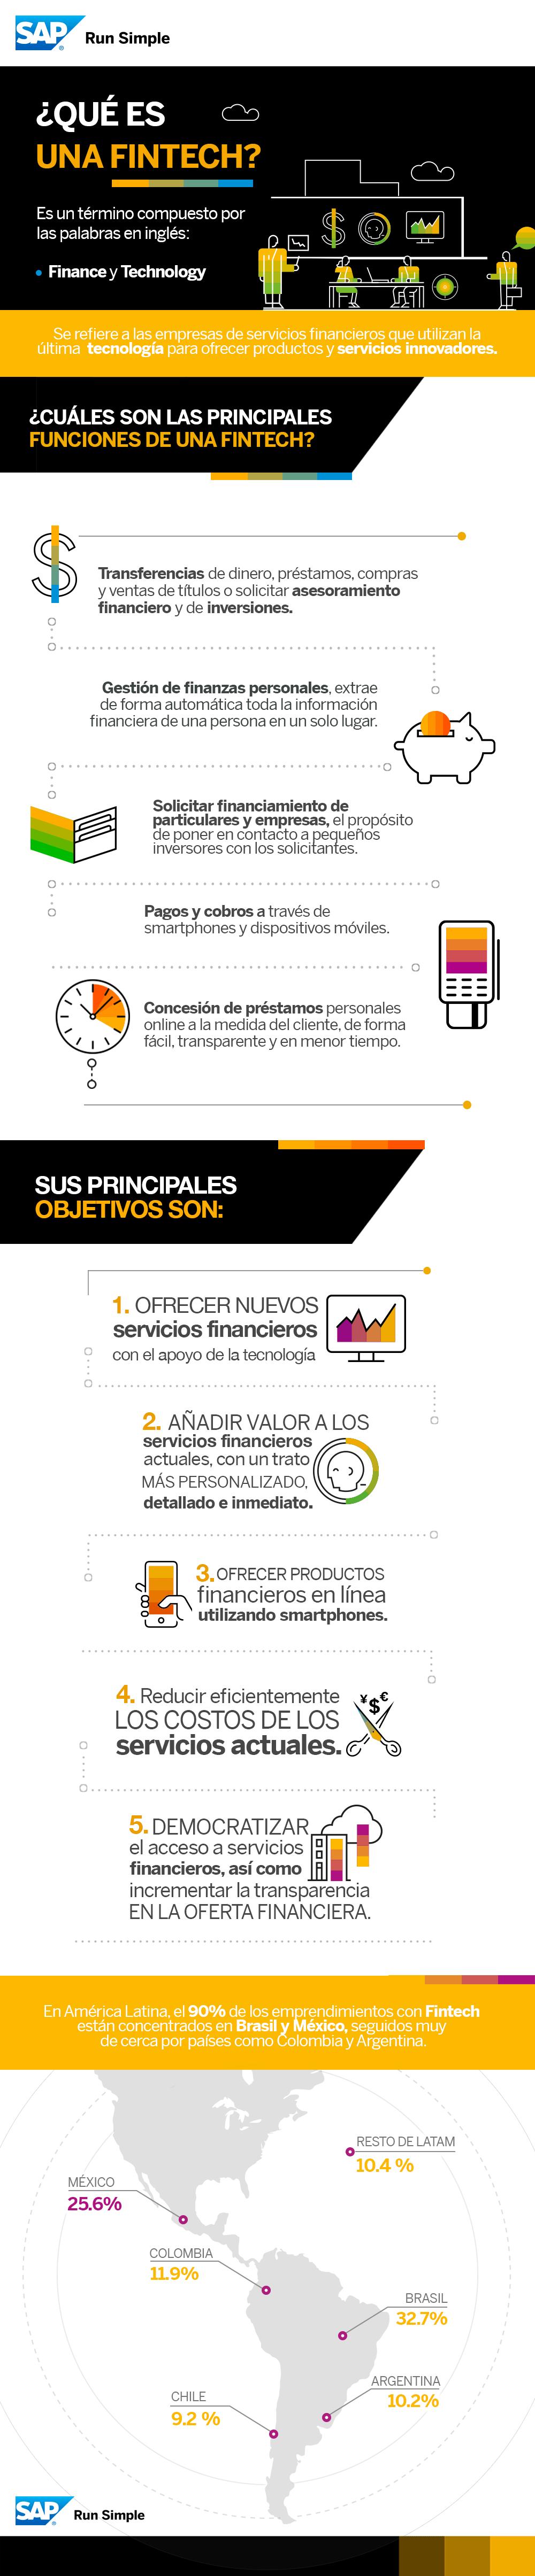 Qué es una Fintech #infografia #infographic